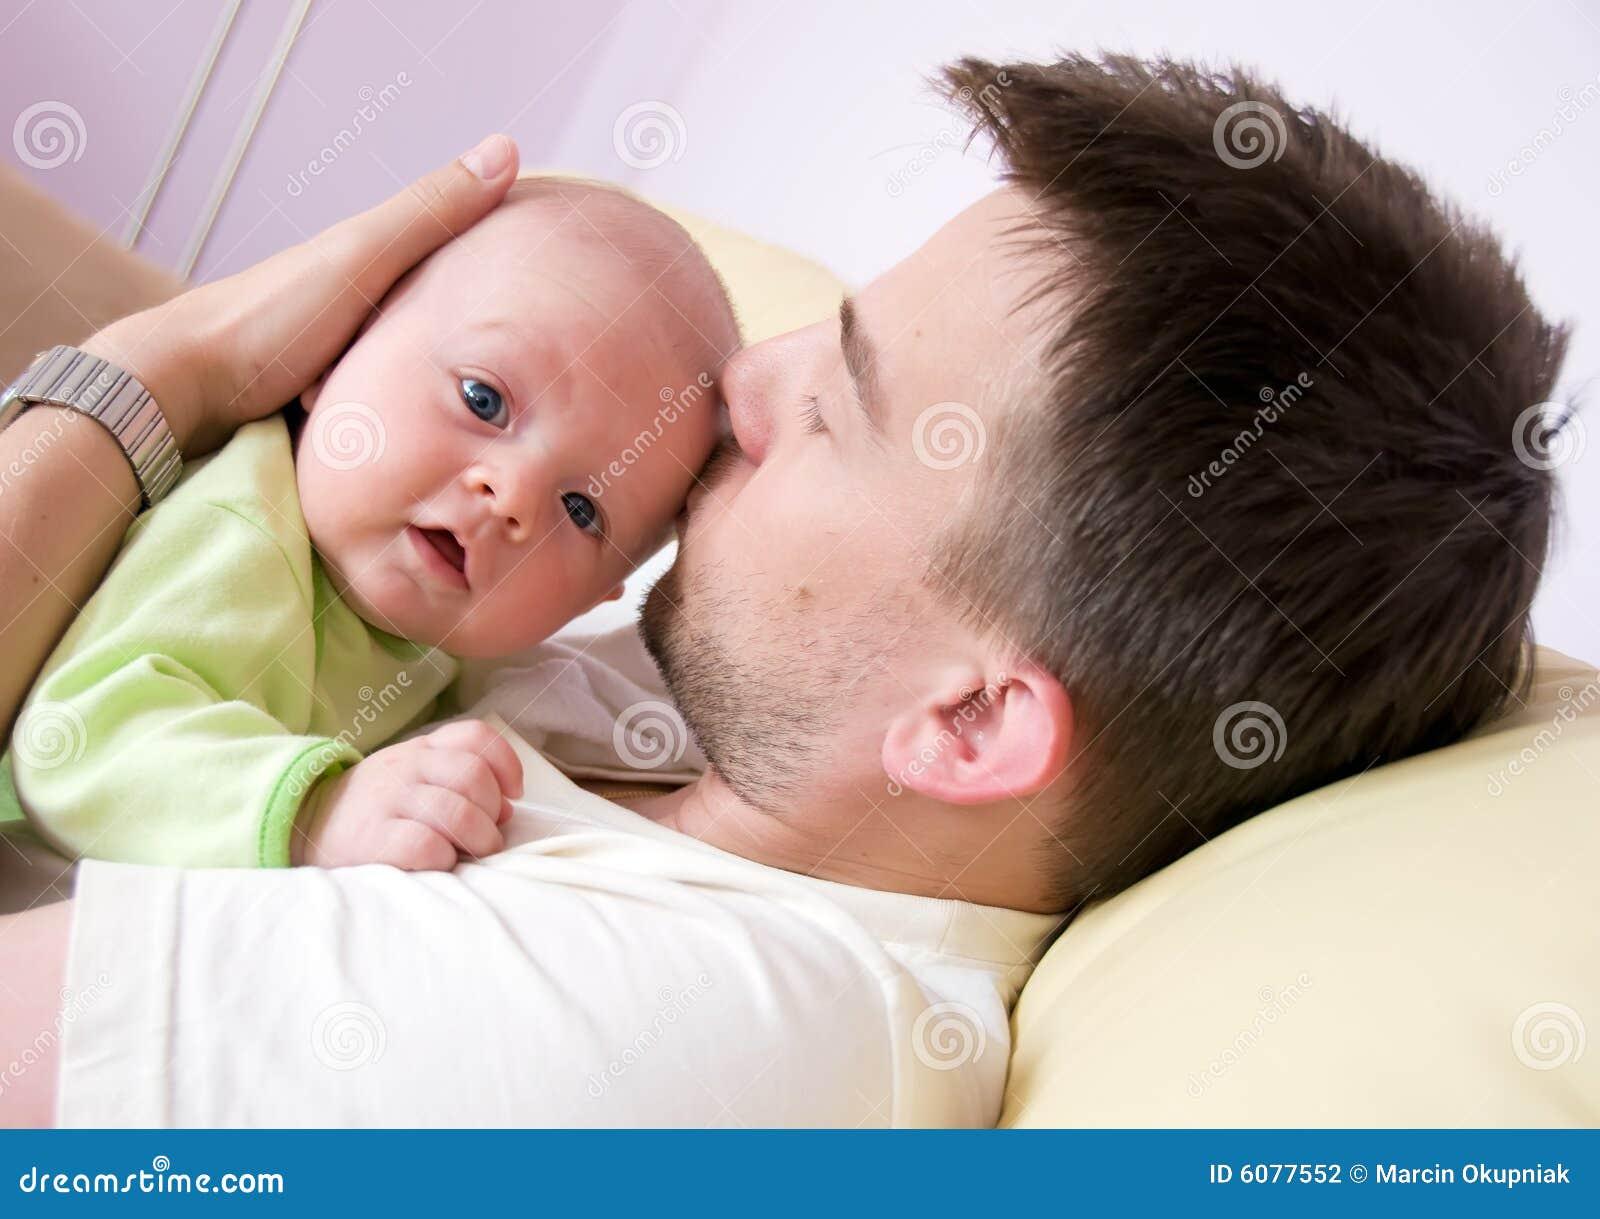 Father with newborn